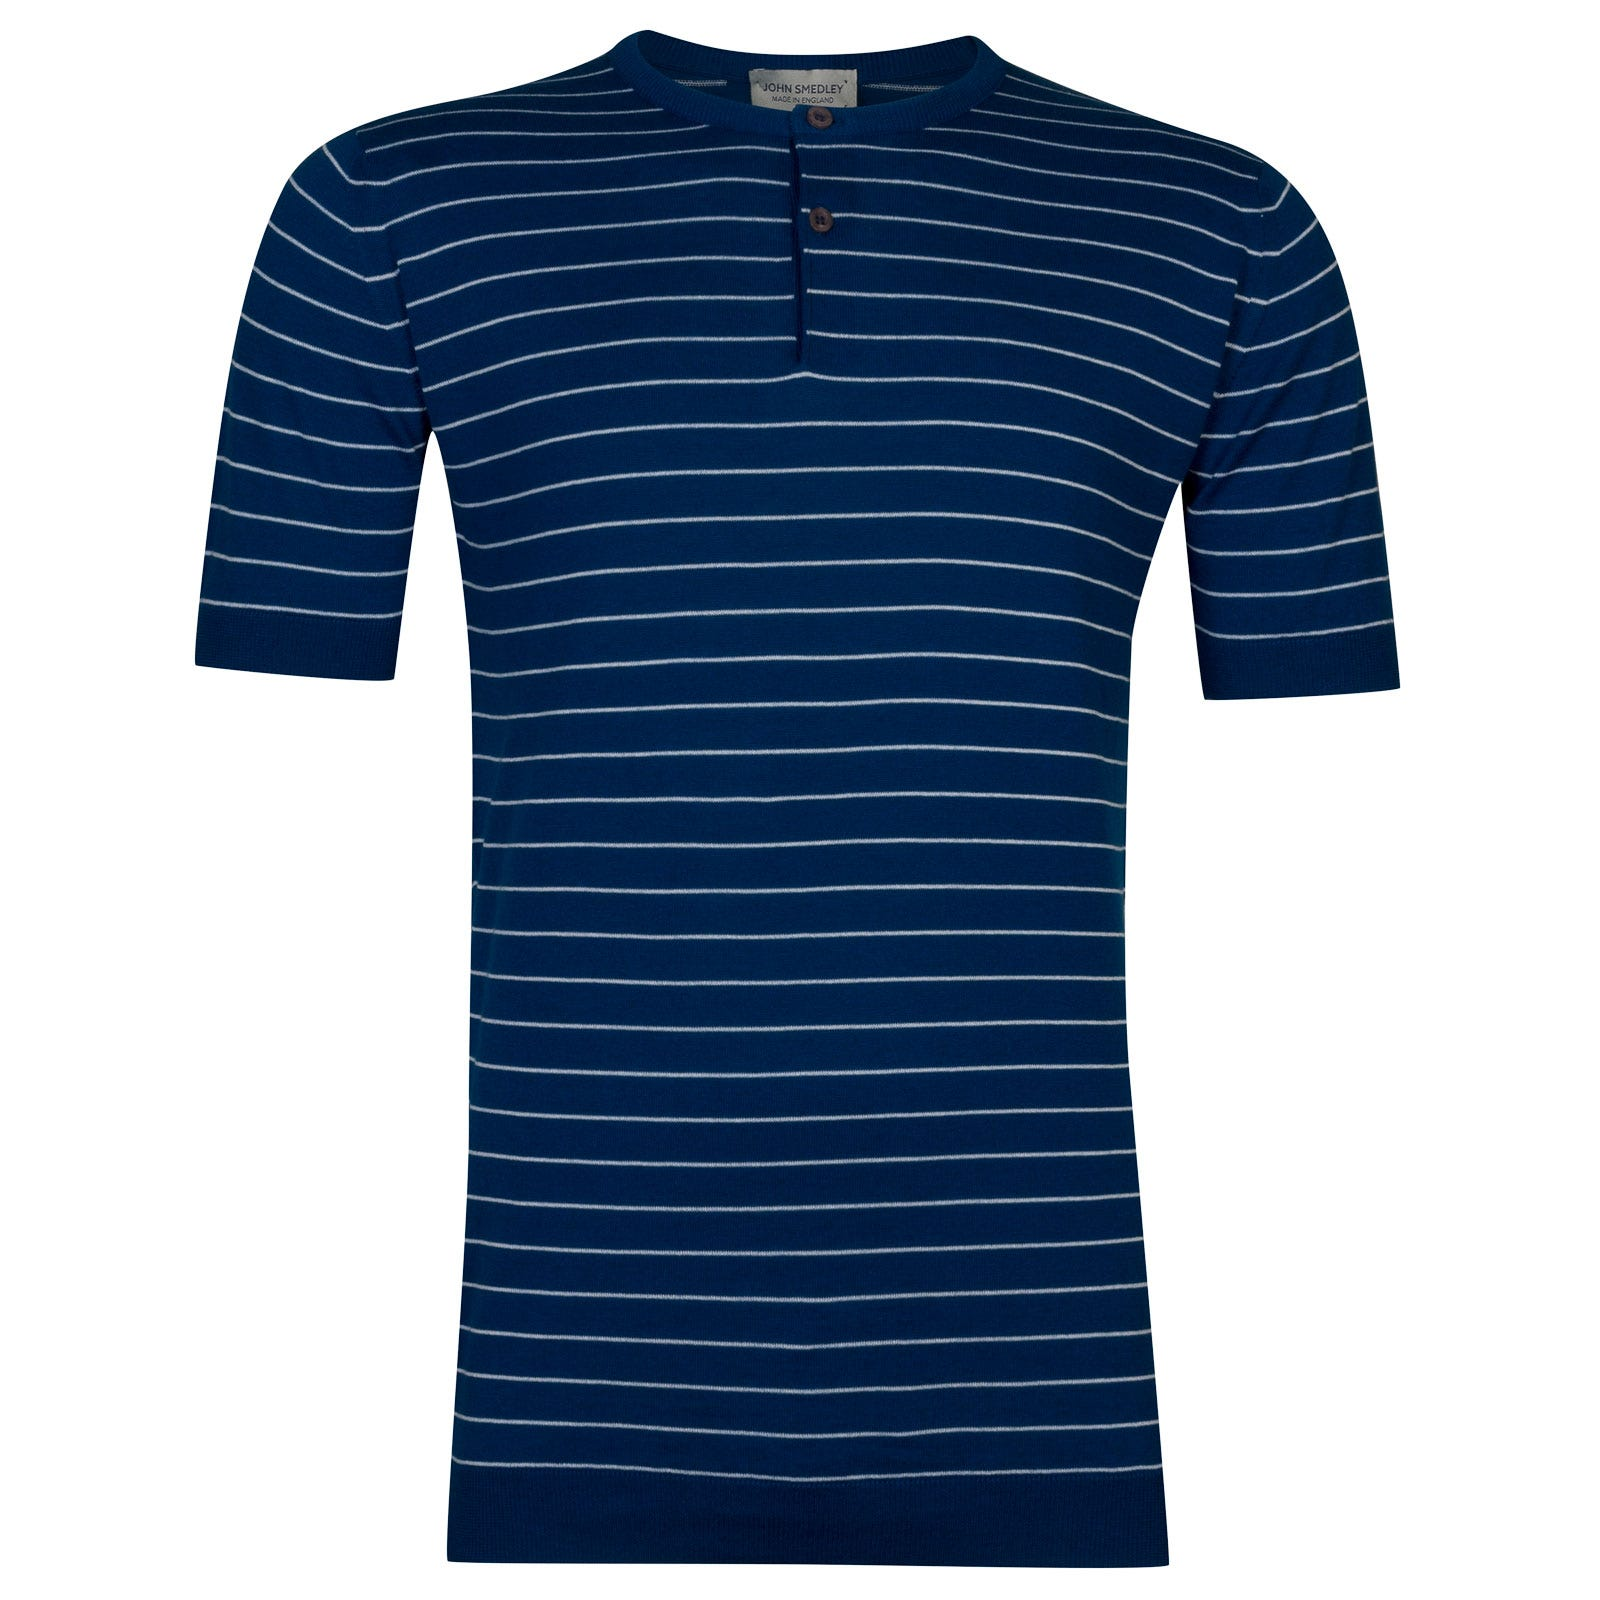 John Smedley Ungers in Stevens Blue Henley Shirt -M